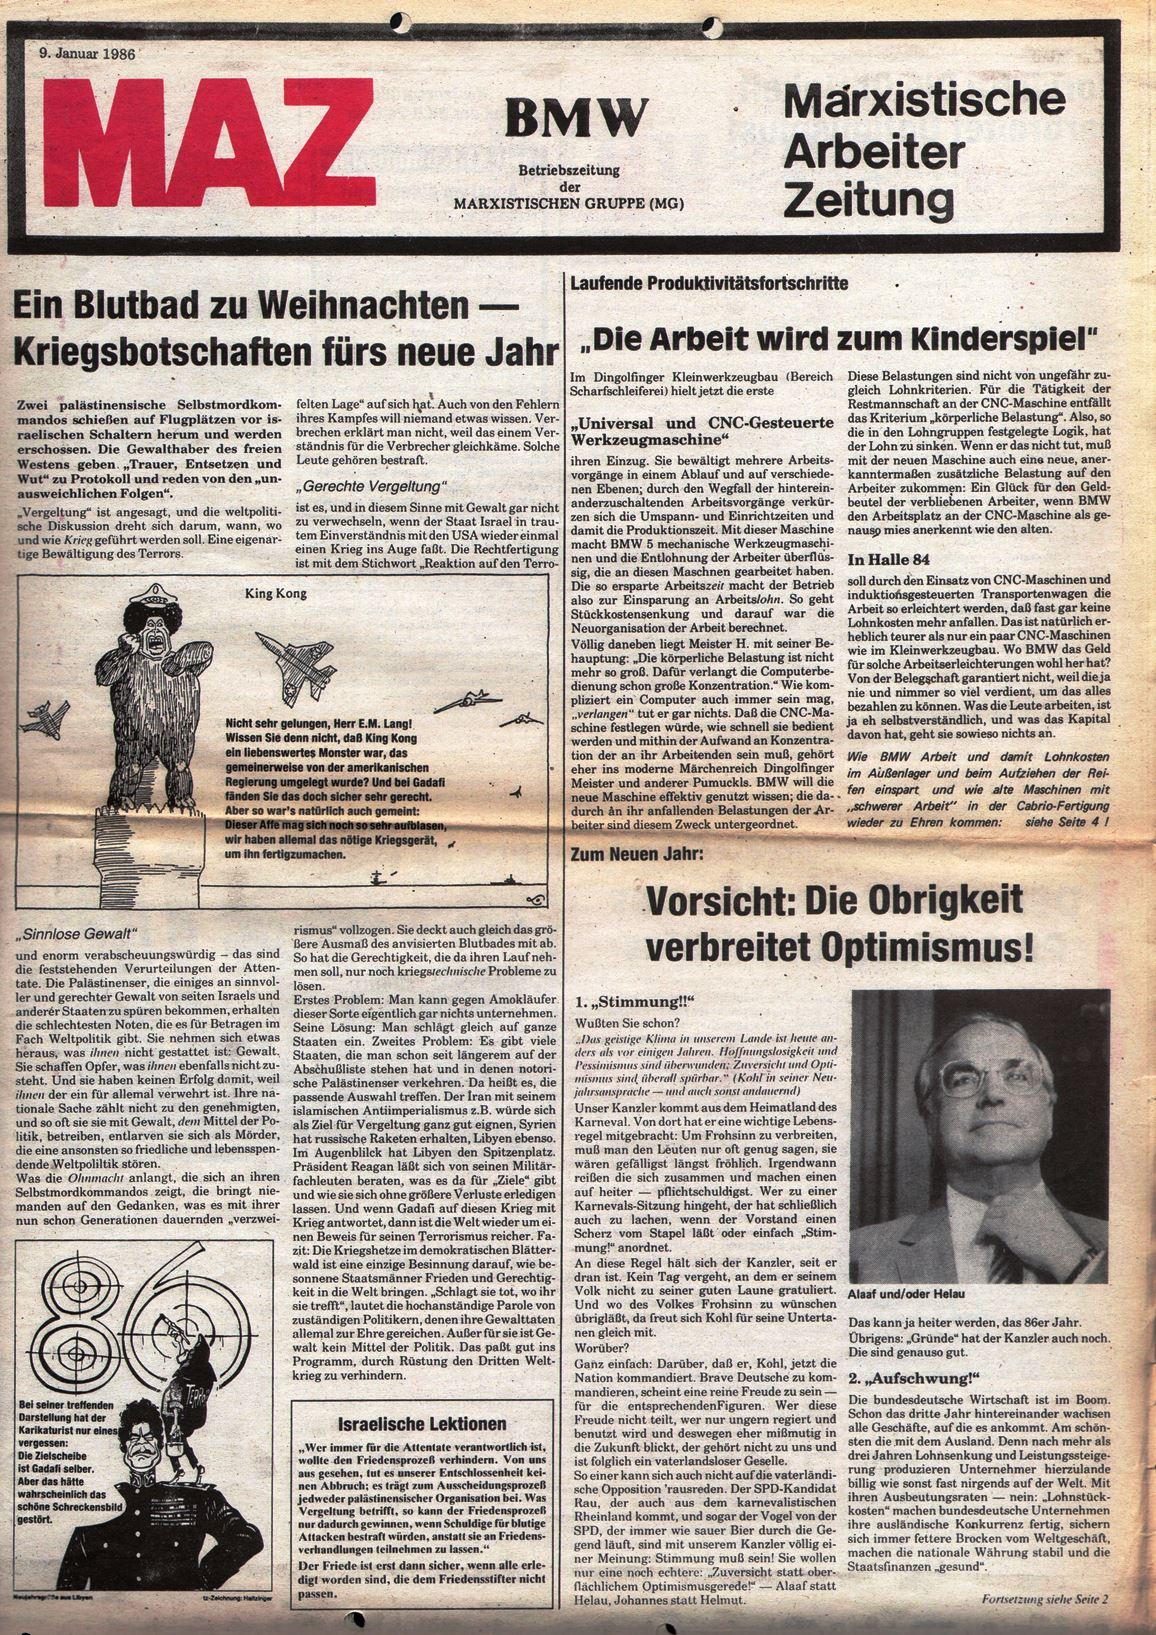 Muenchen_MG_MAZ_BMW_19860109_01